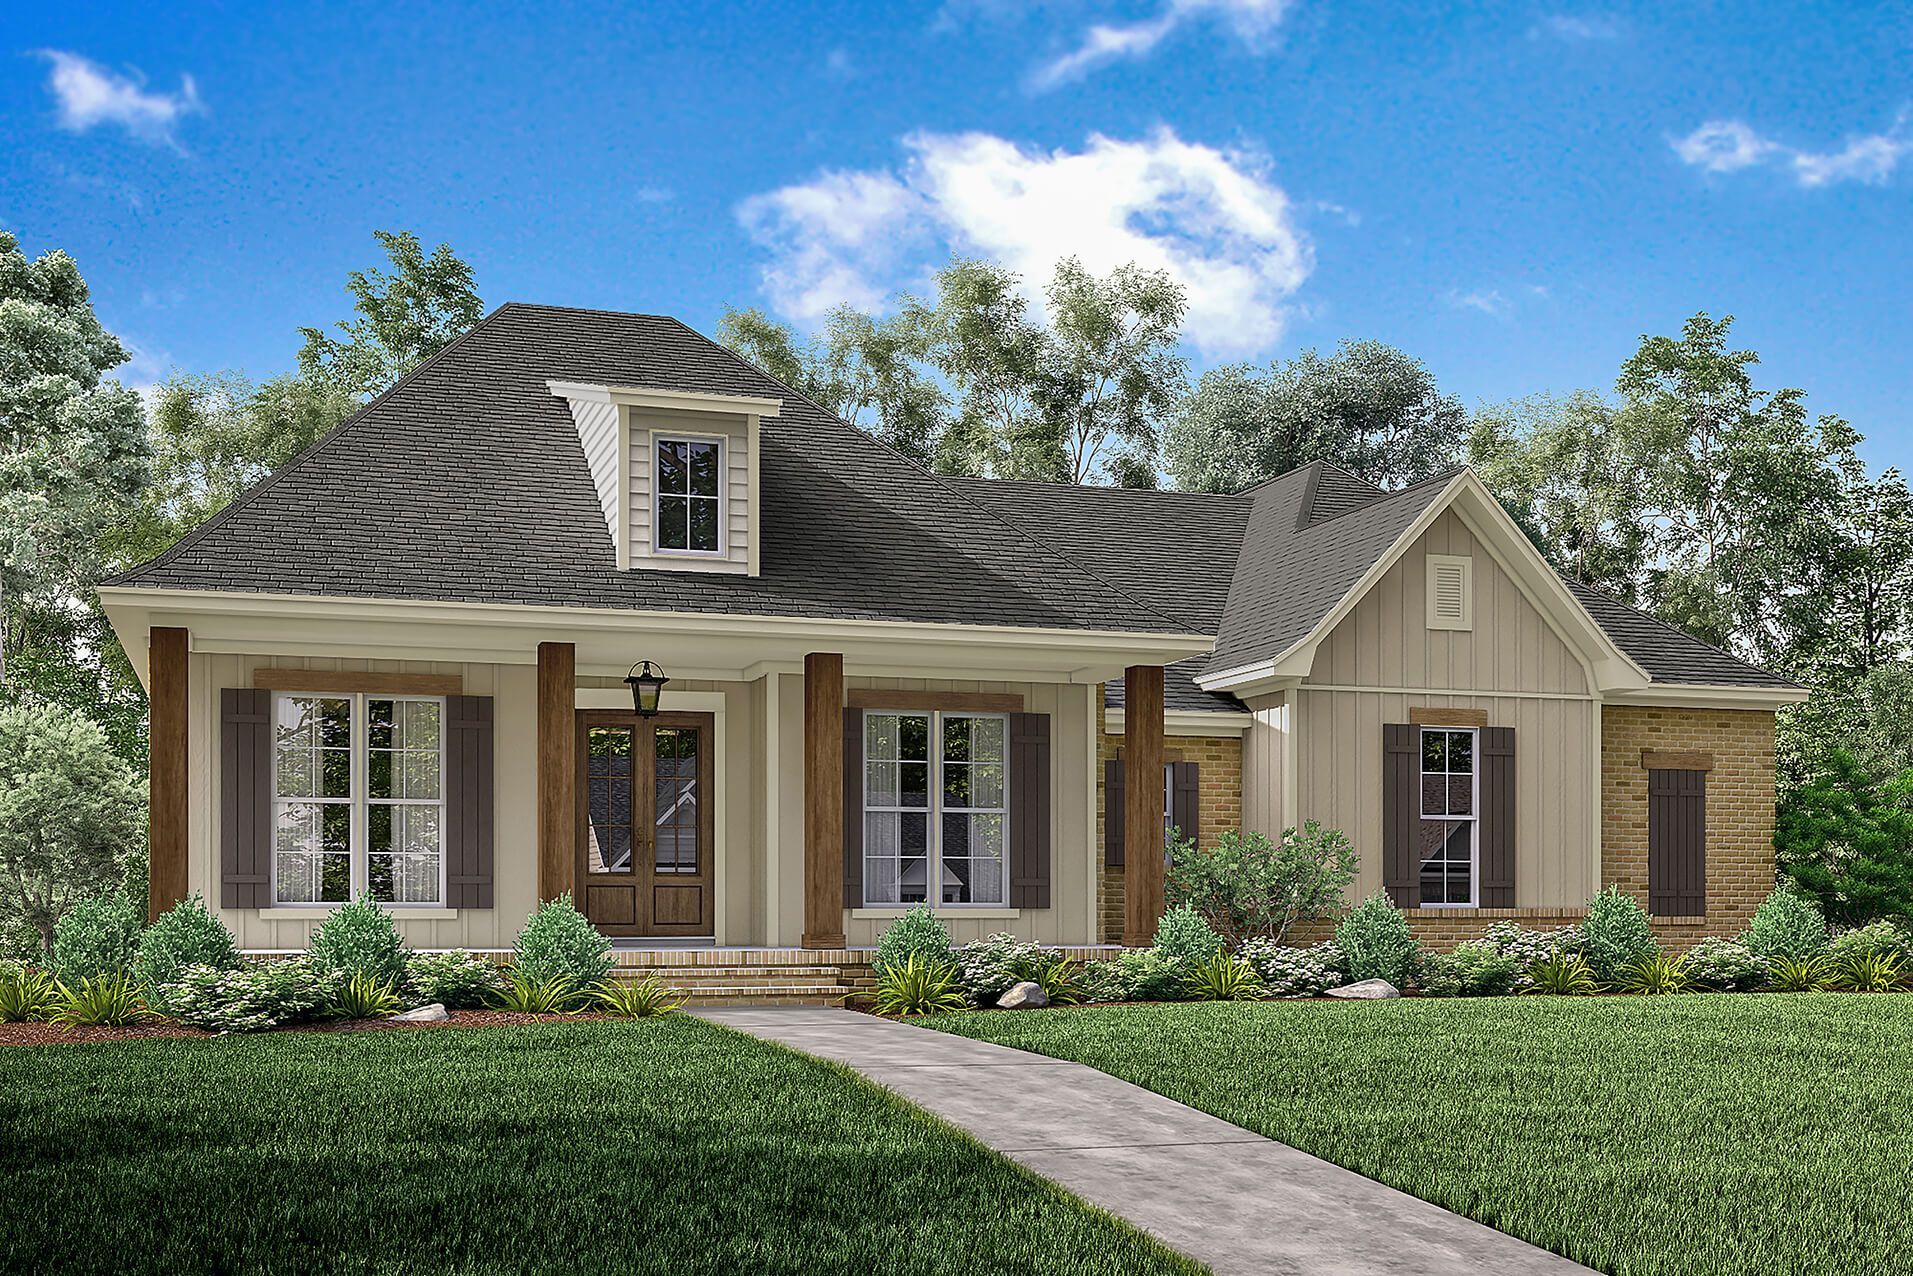 Download Acadian Cottage Style Home - ca0c016452988d672533820212ffd925  You Should Have_411064.jpg